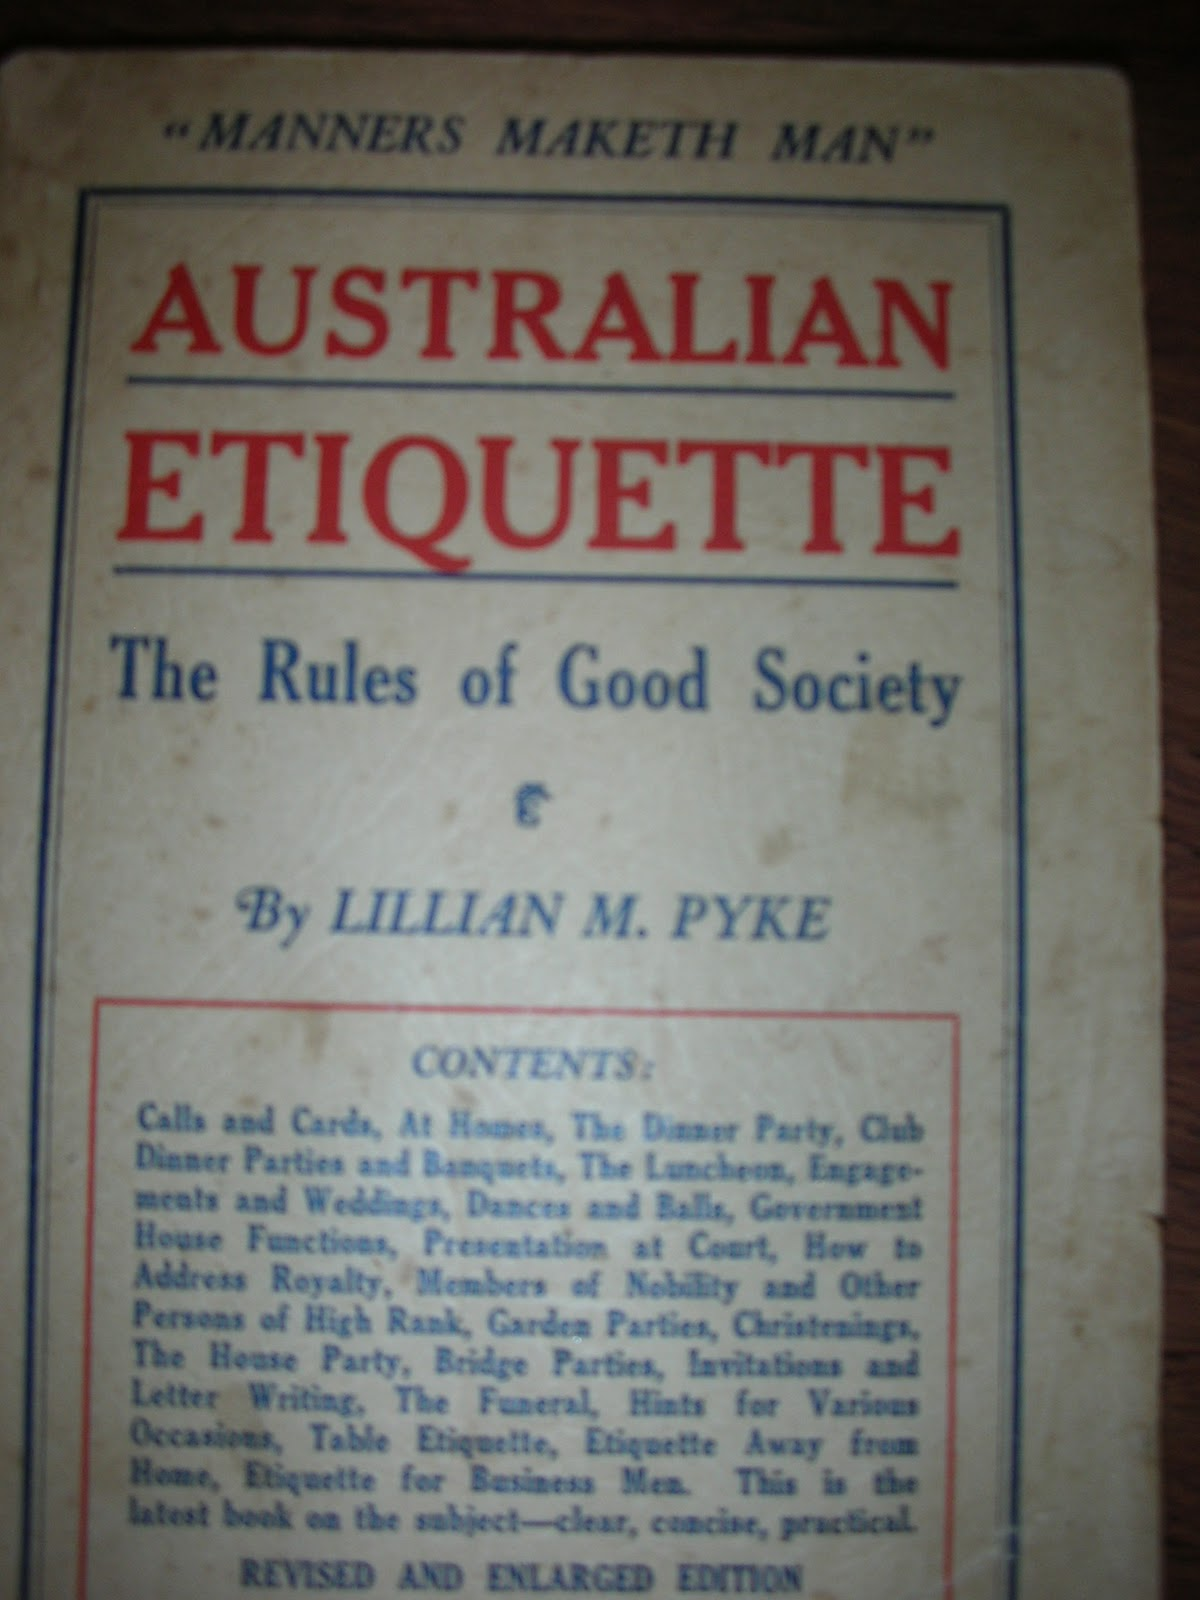 Dating etiquette in Melbourne